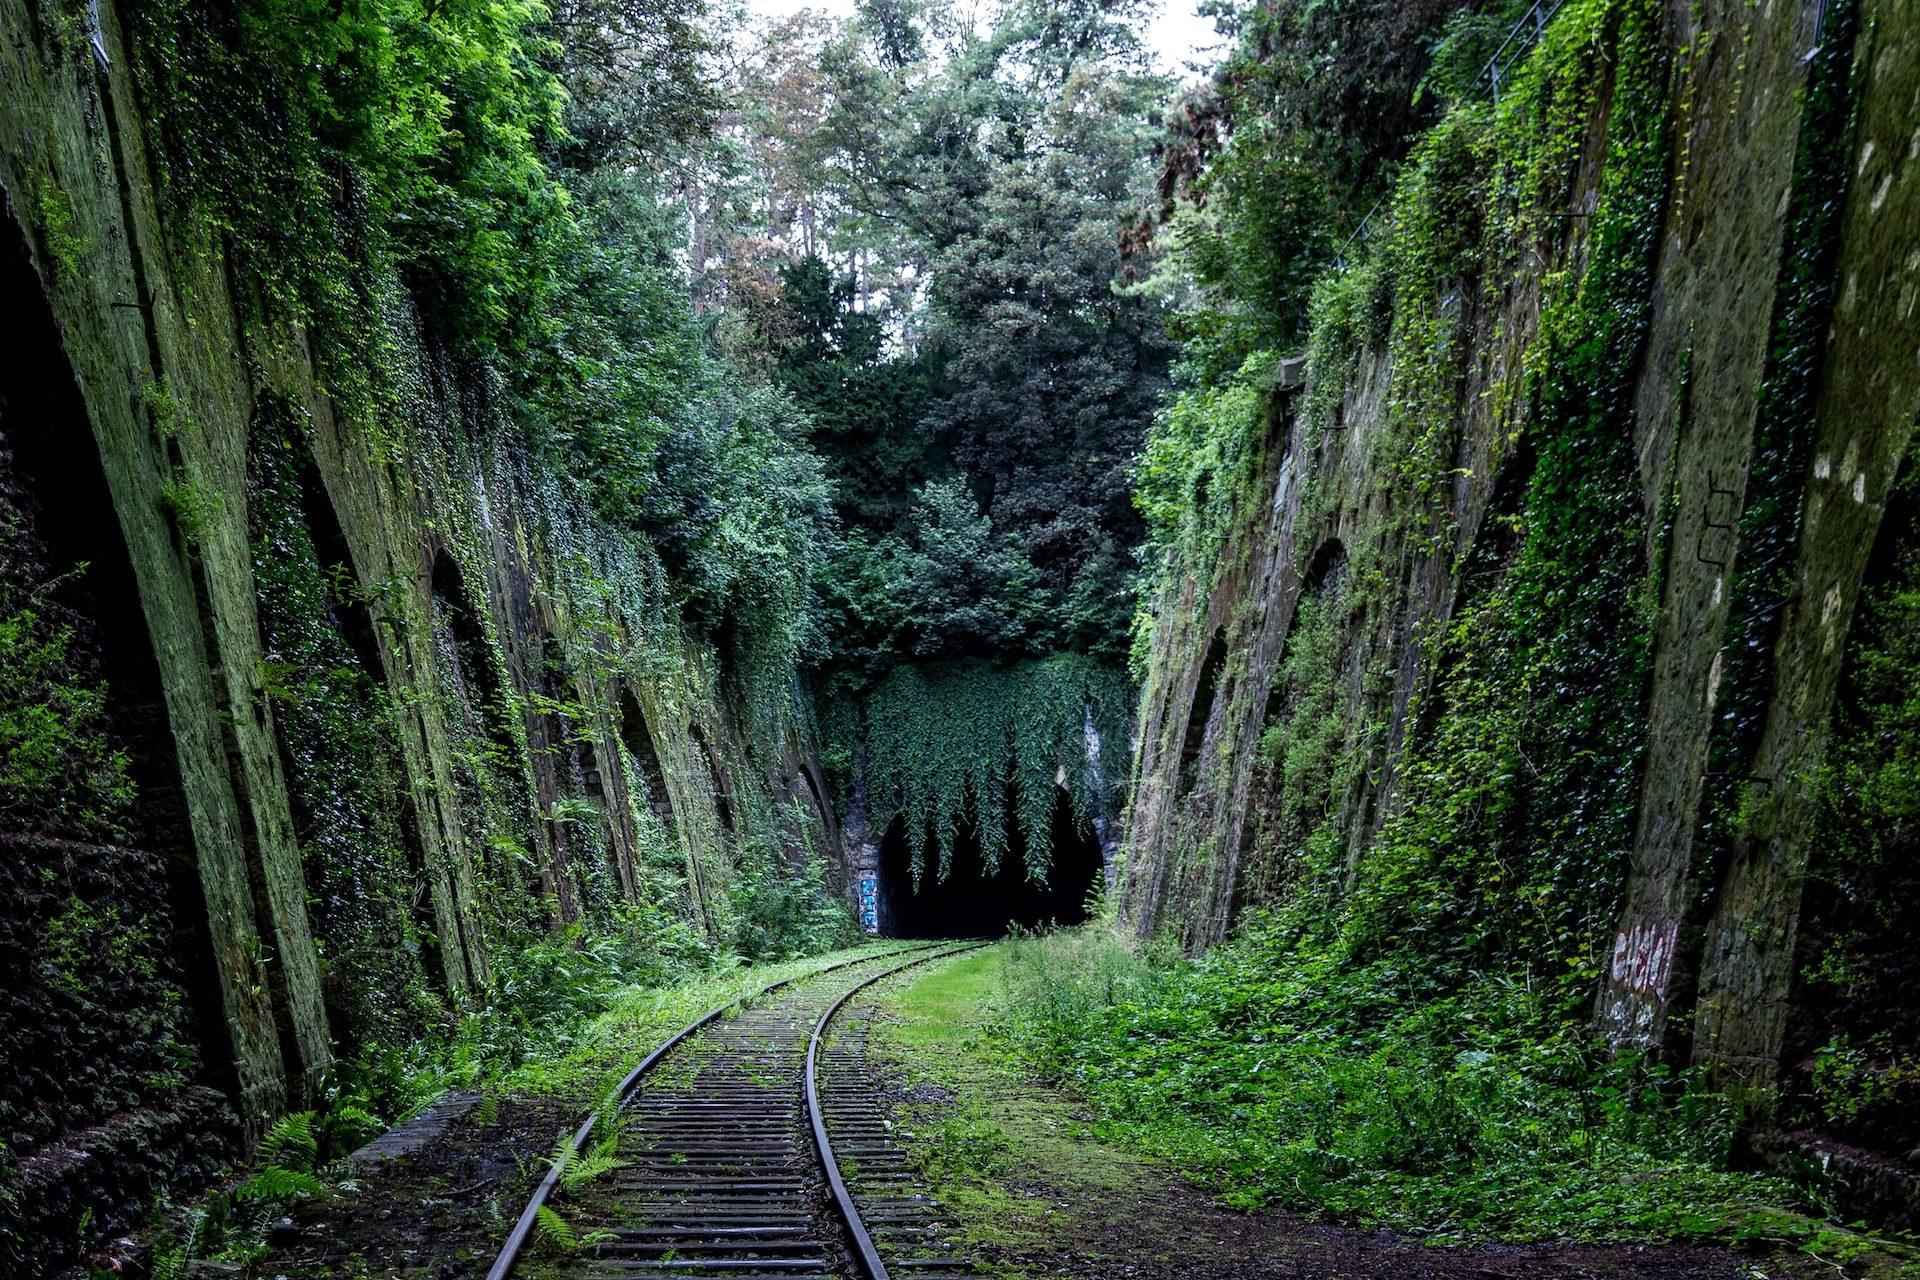 via, pasaje, tunel, maleza, árboles - Fondos de Pantalla HD - professor-falken.com